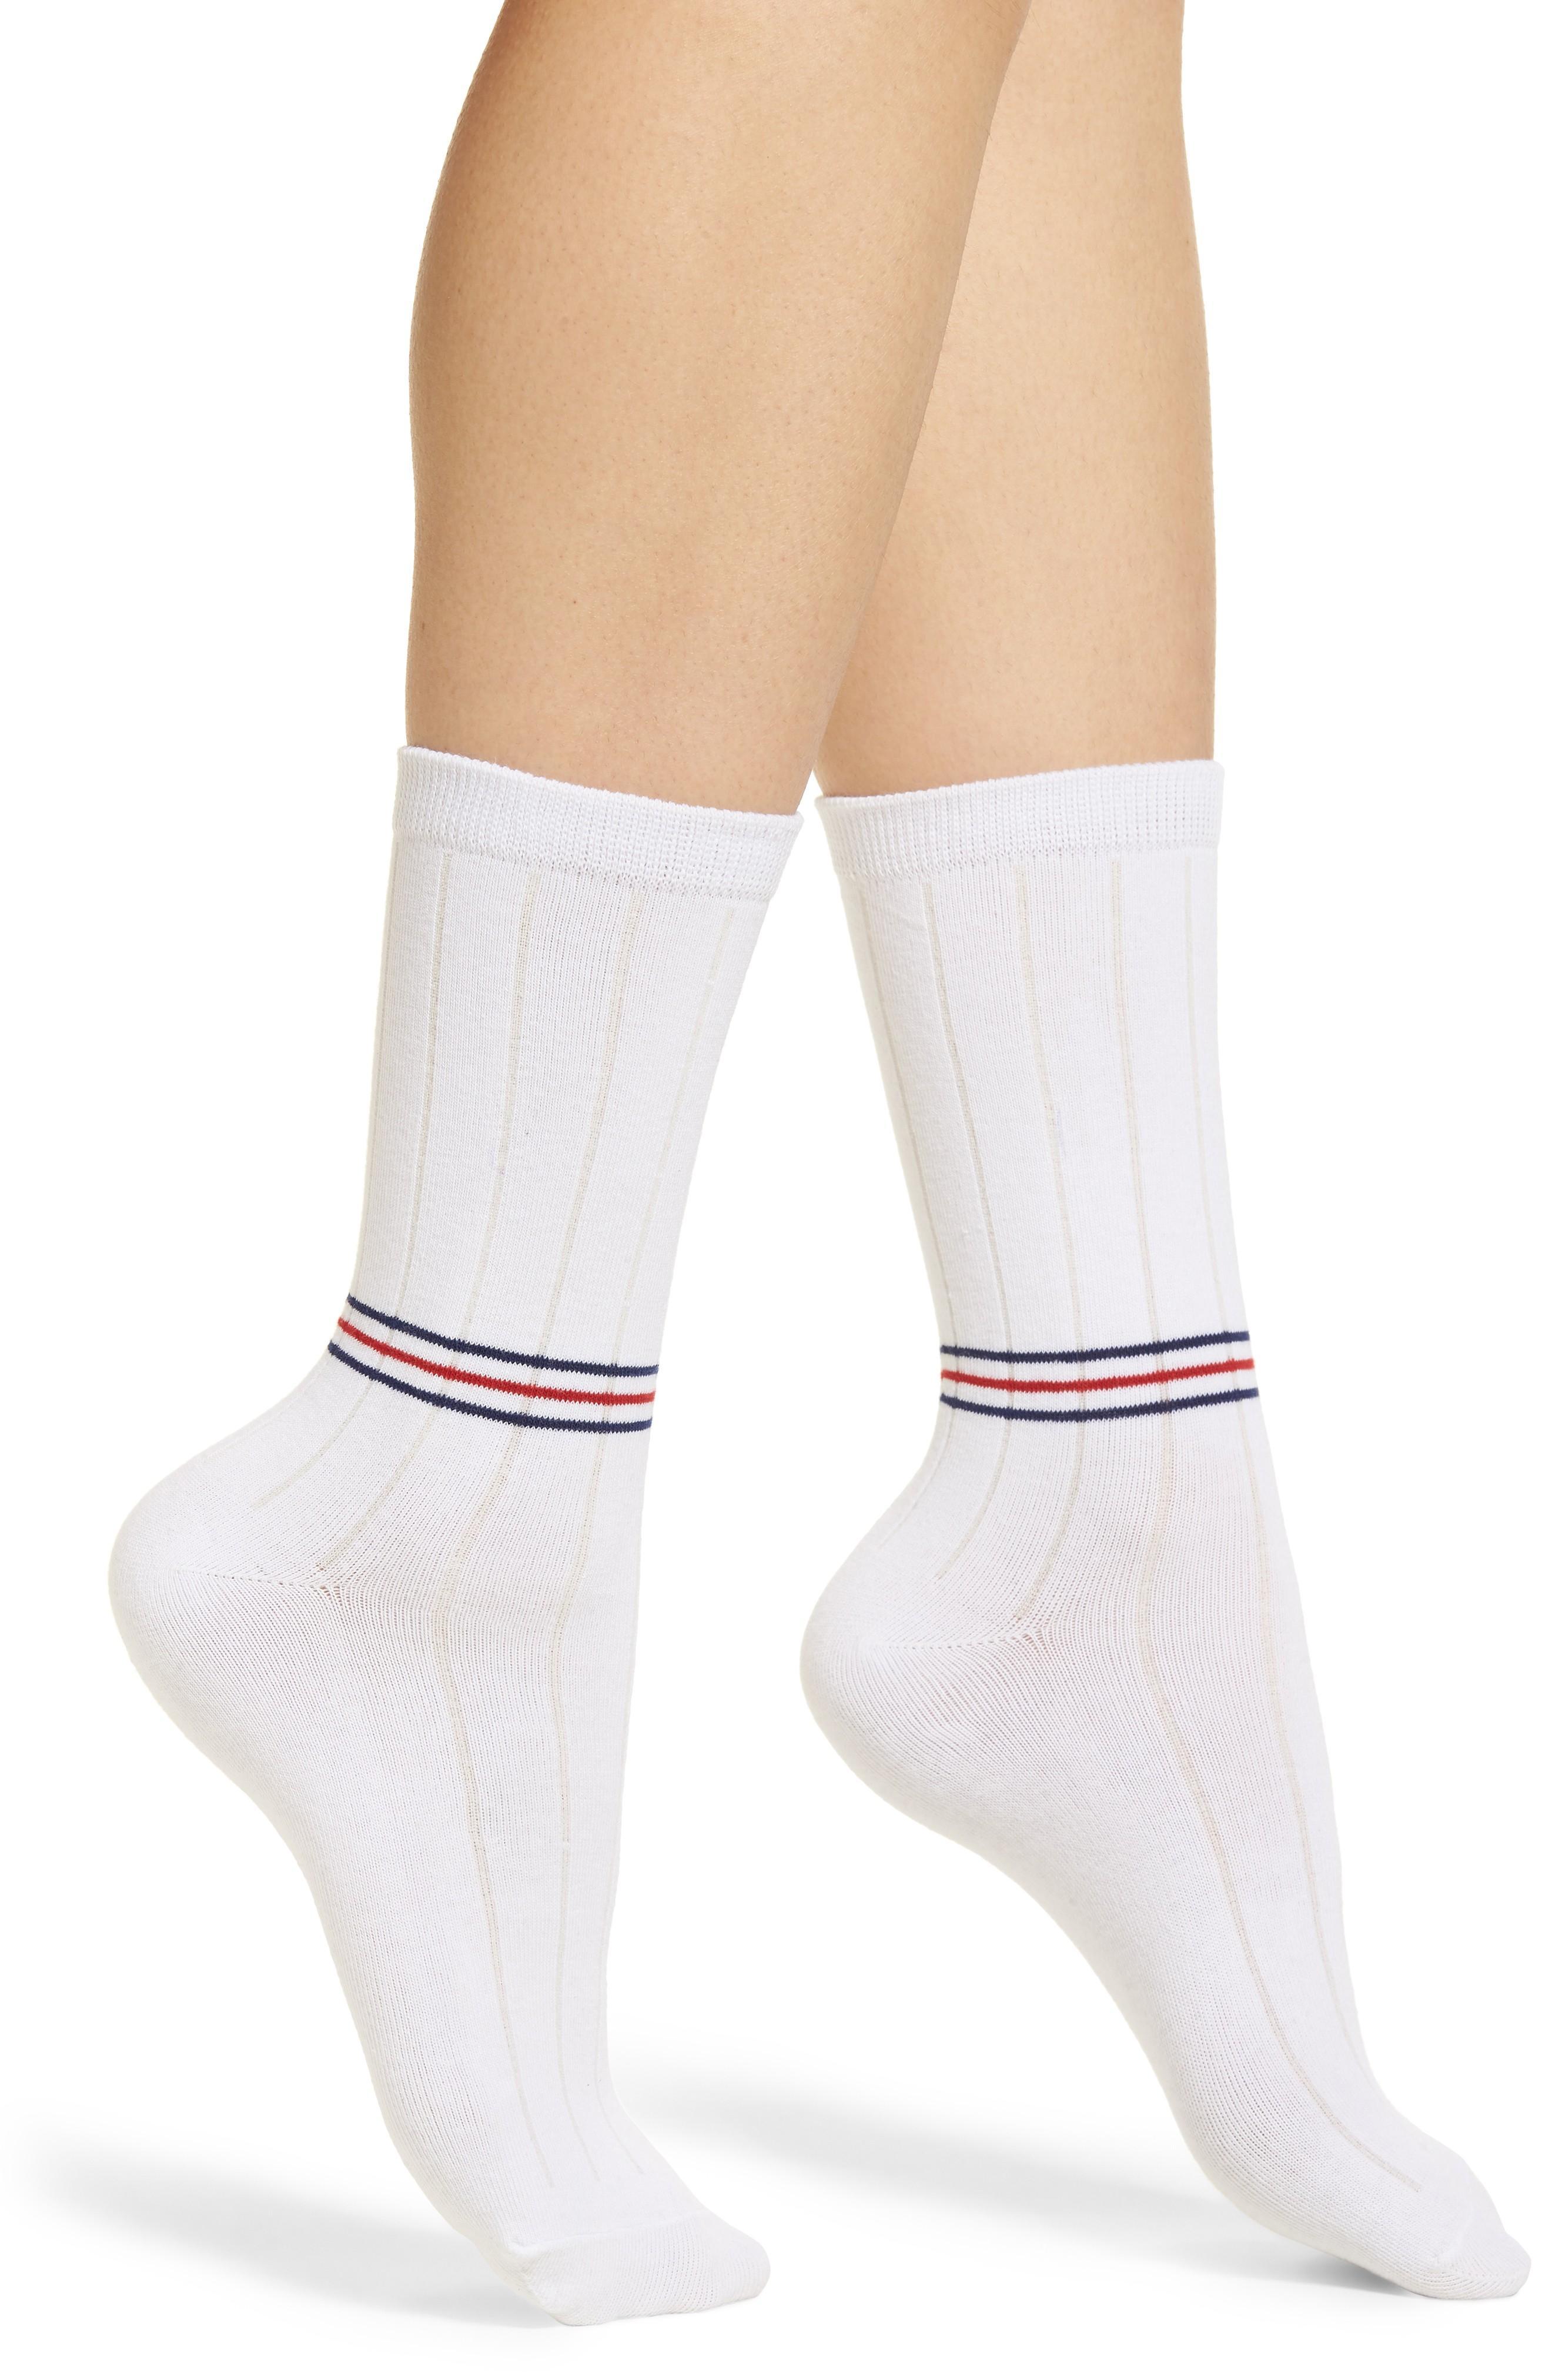 Richer Poorer Rocky Classic Crew Socks In White